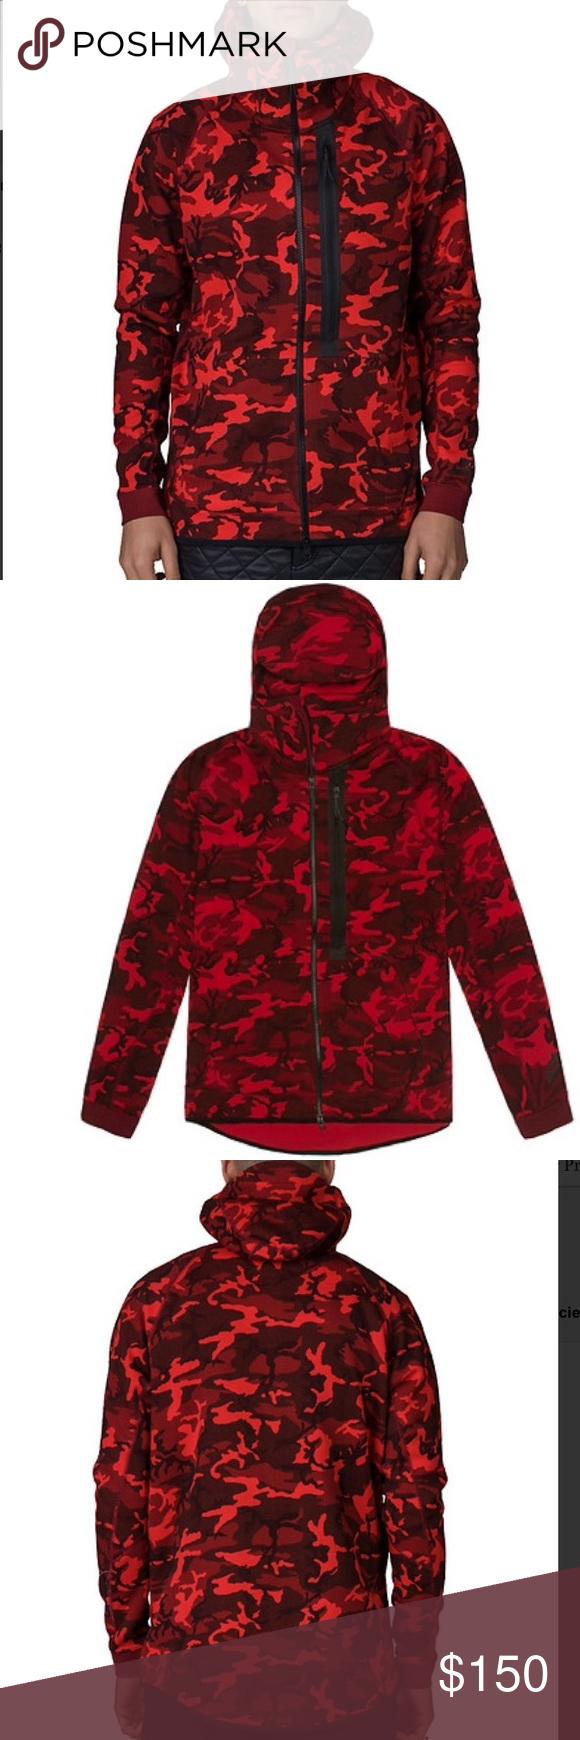 700fb4d8fd78 Nike Red Tech Fleece Full Zip Camo Hoodie Sweater NIKE Tech fleece full zip  camouflage hoodie